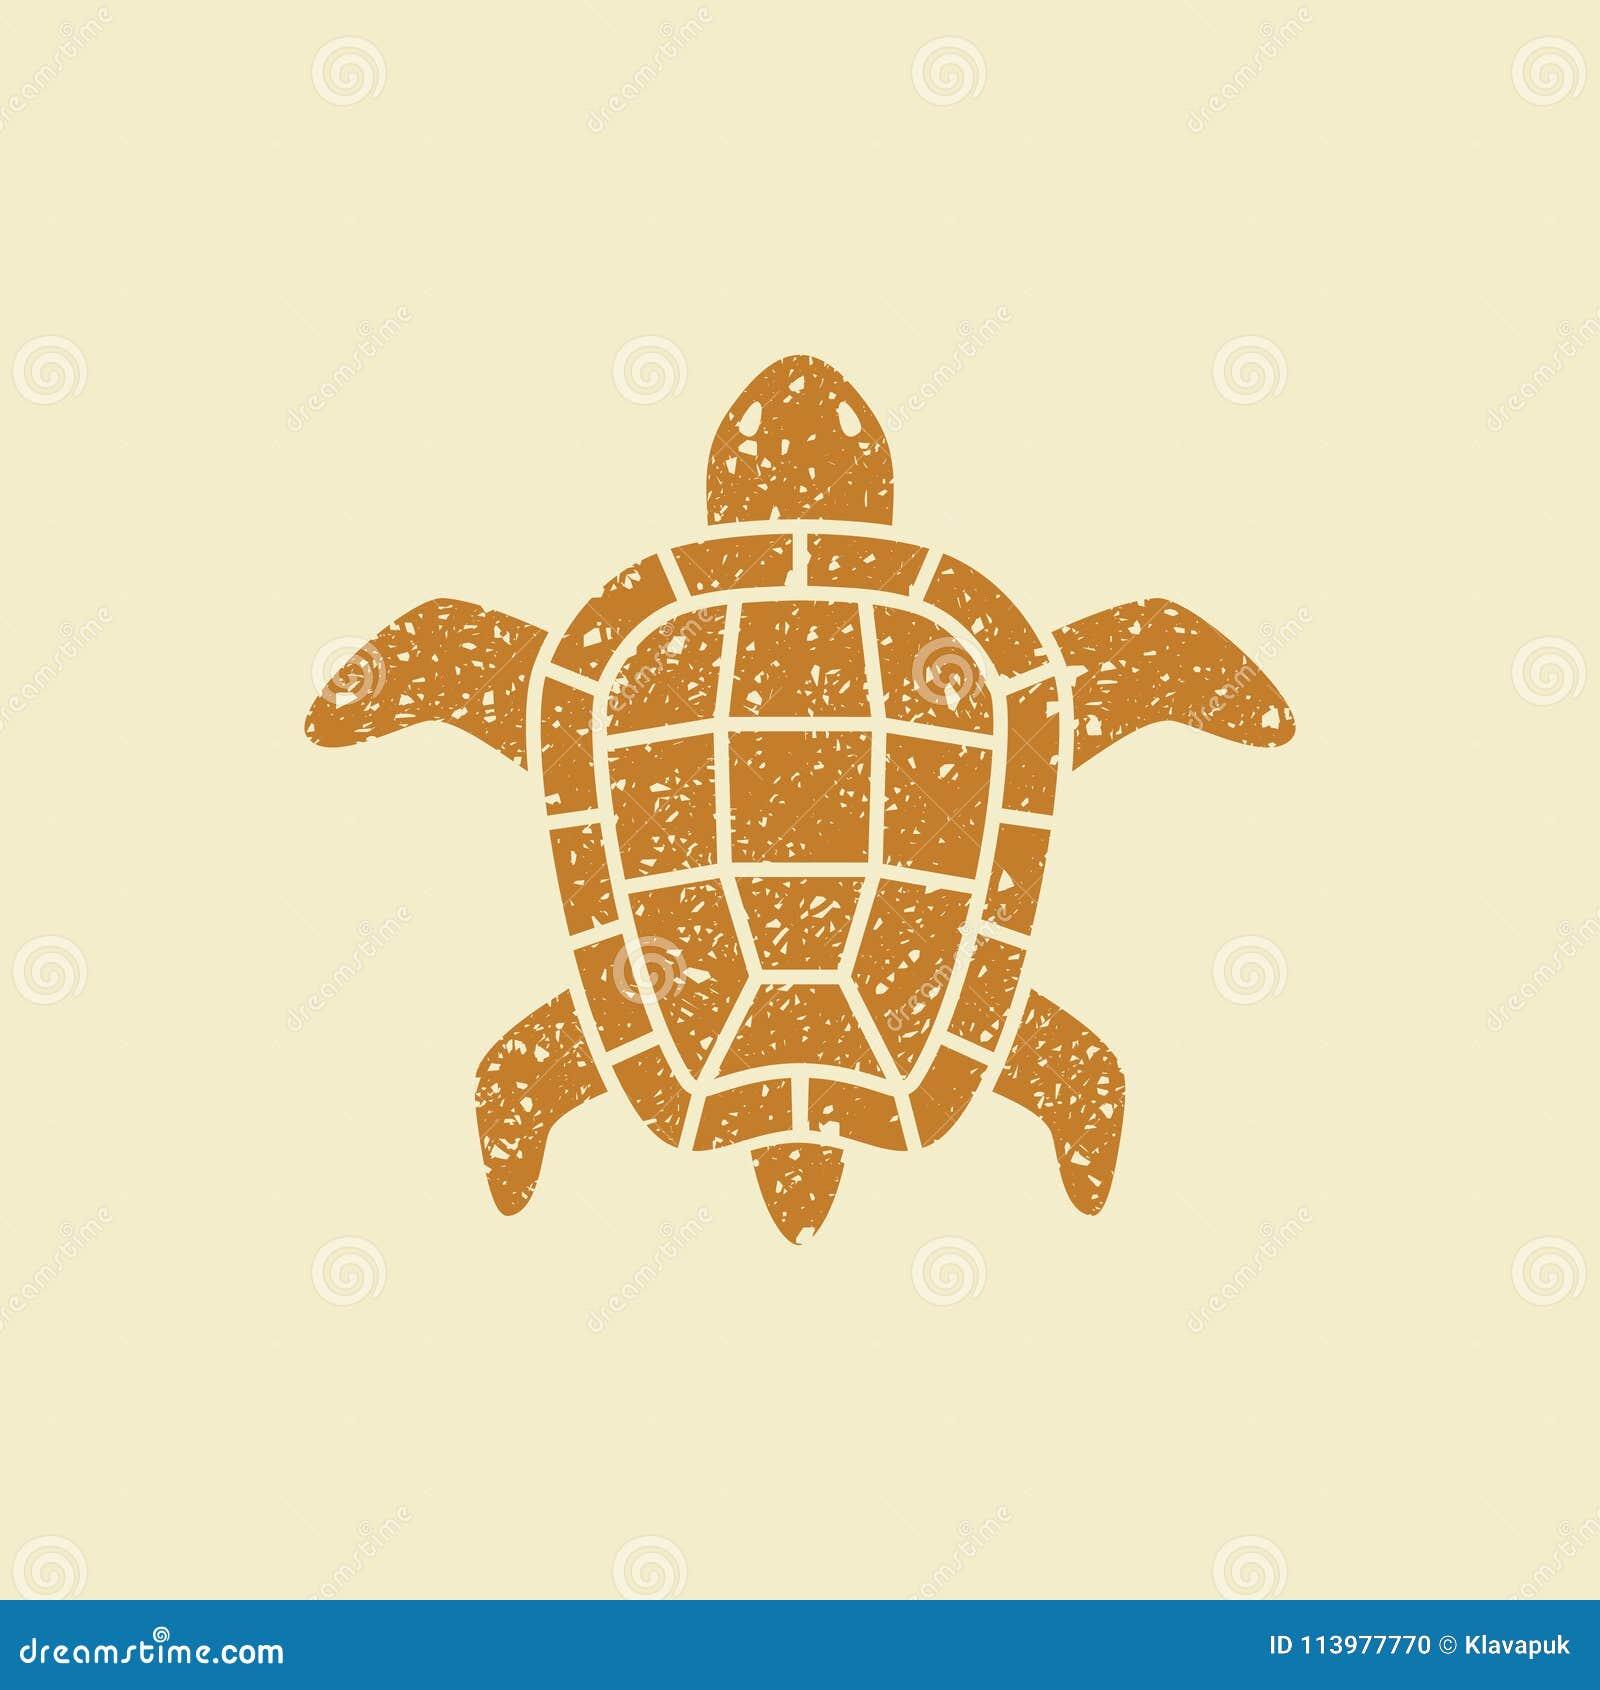 8166eba48 Turtle flat icon stock vector. Illustration of shell - 113977770